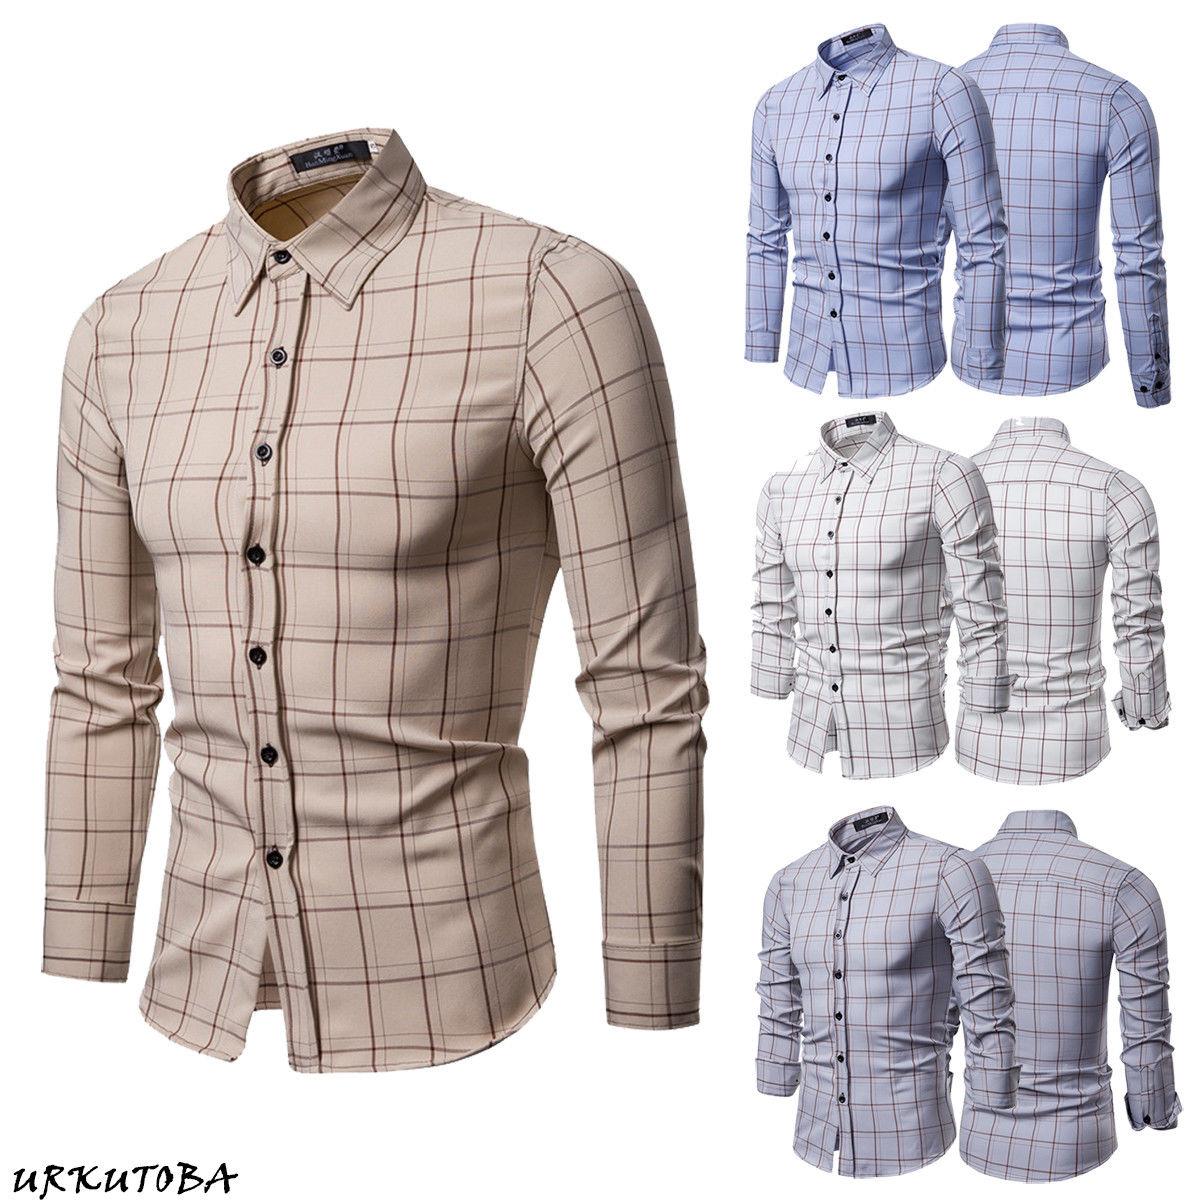 2fc4423a40d72 Luxury Mens Slim Fit Shirt Long Sleeve Cotton Stylish Formal Casual Plaid  Shirts Top